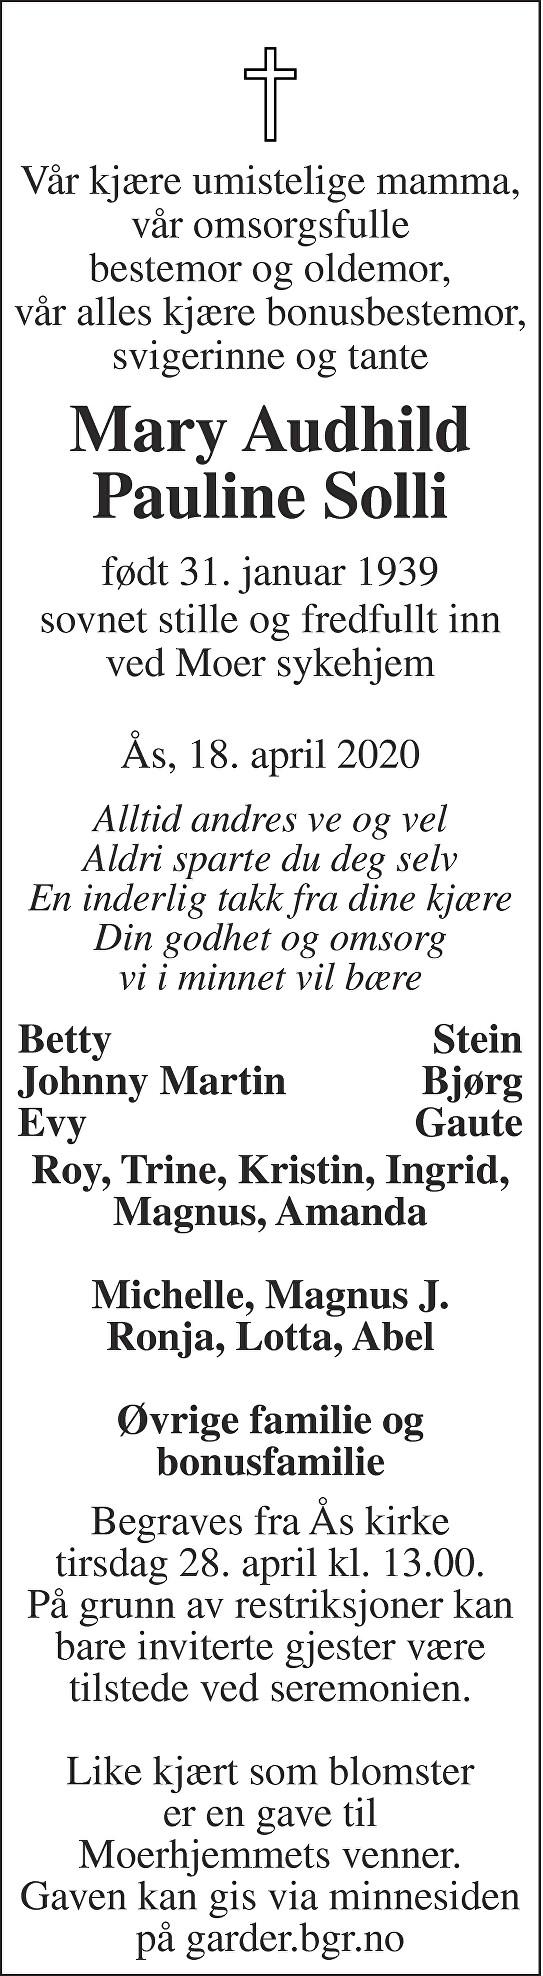 Mary Audhild Pauline Solli Dødsannonse